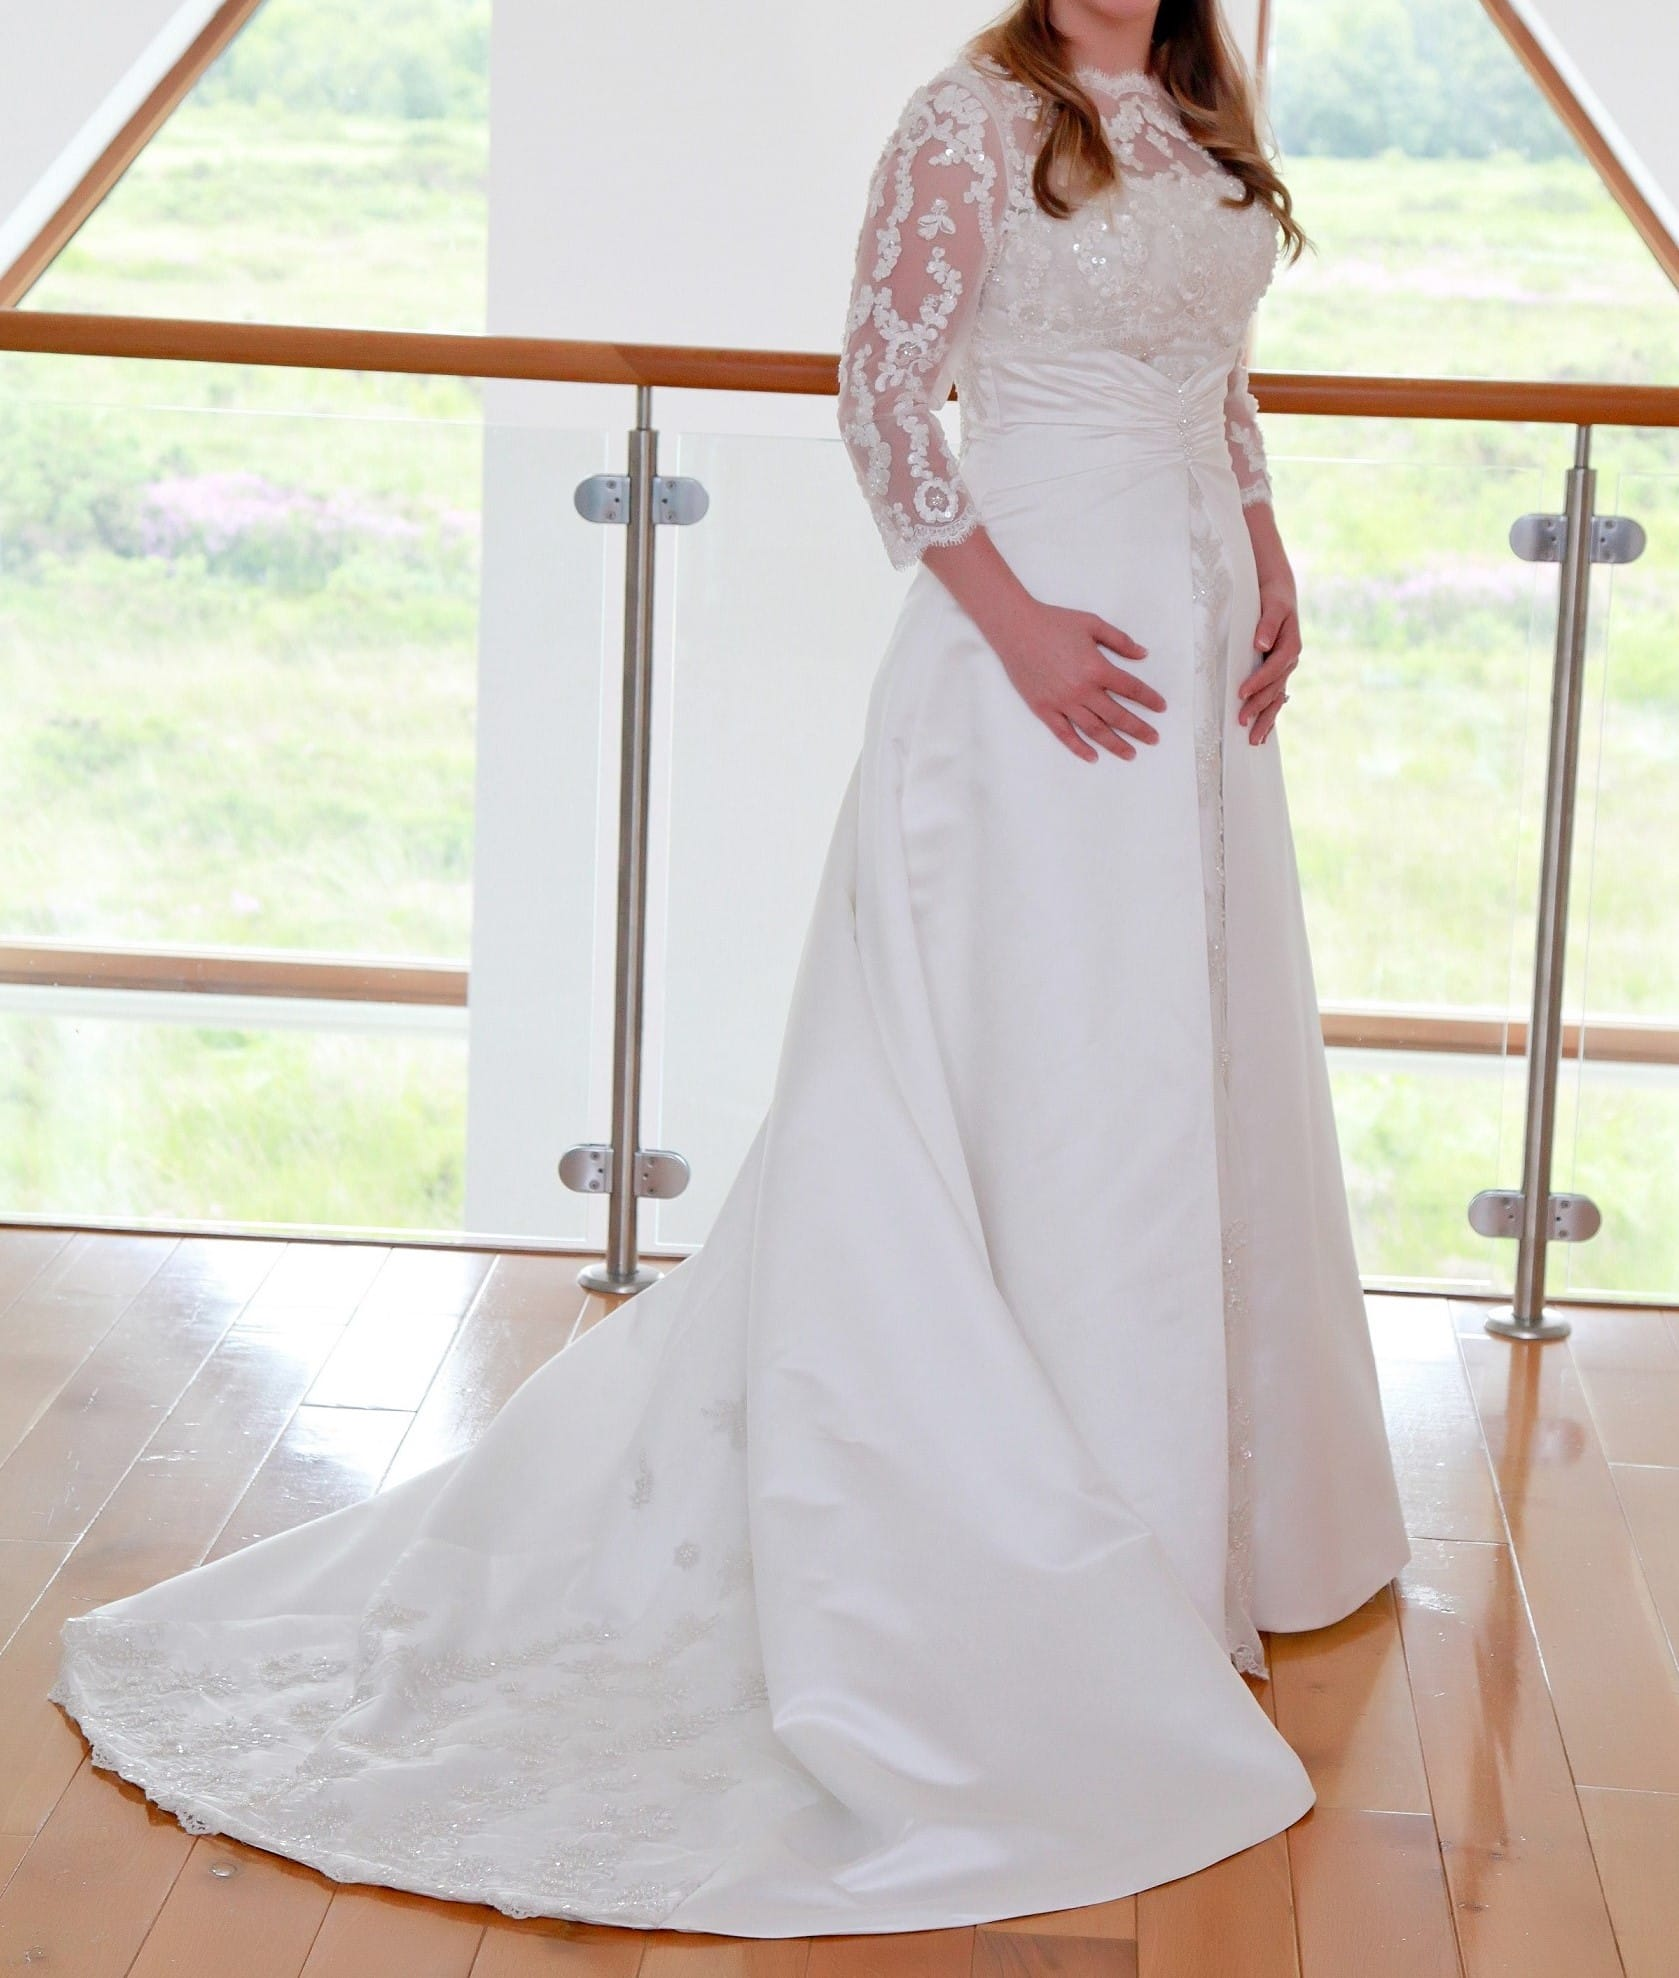 Rosette Nicolini Adrienne Medieval Style Wedding Dress